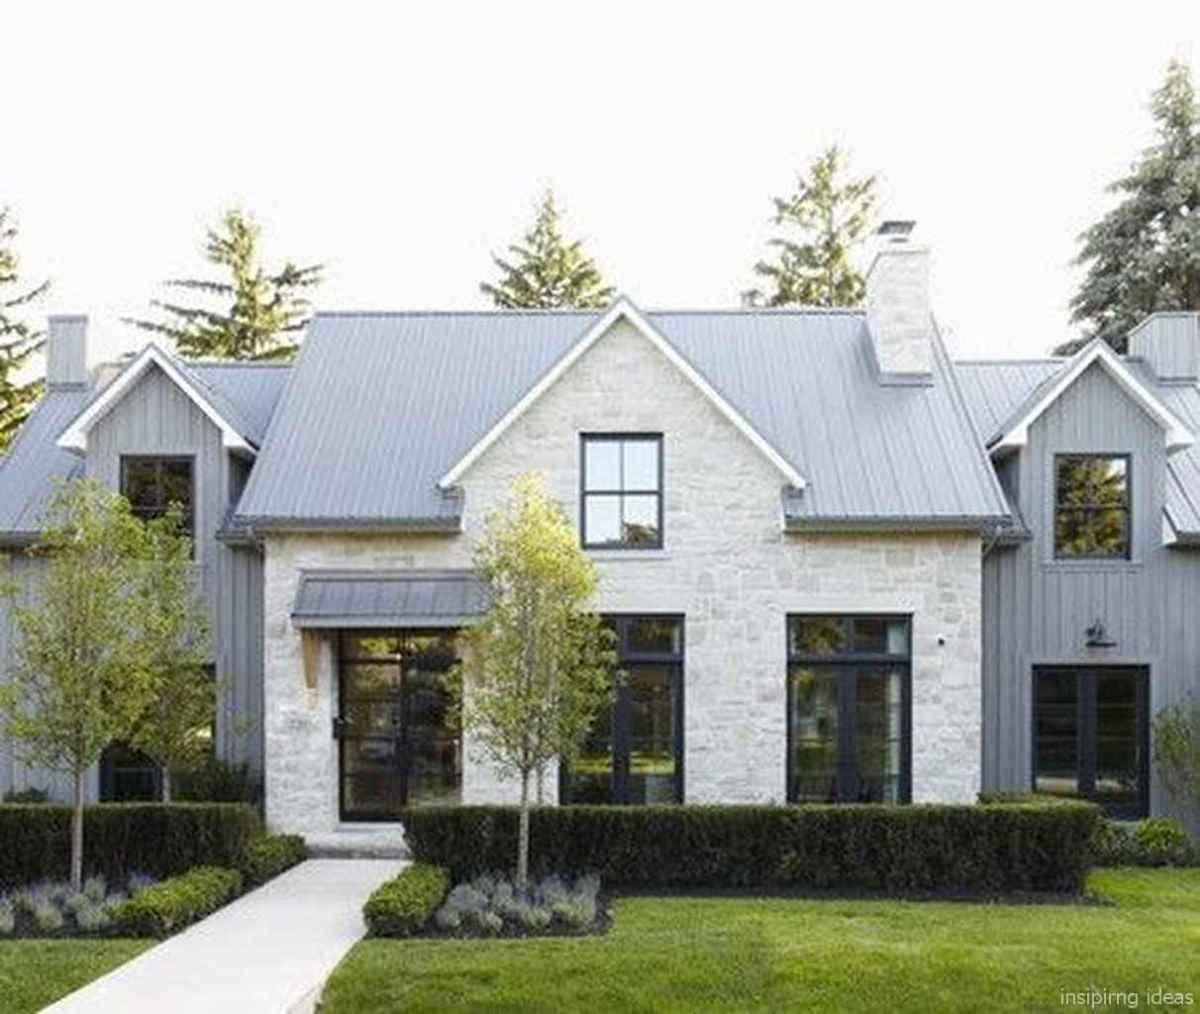 70 affordable modern farmhouse exterior plans ideas 31